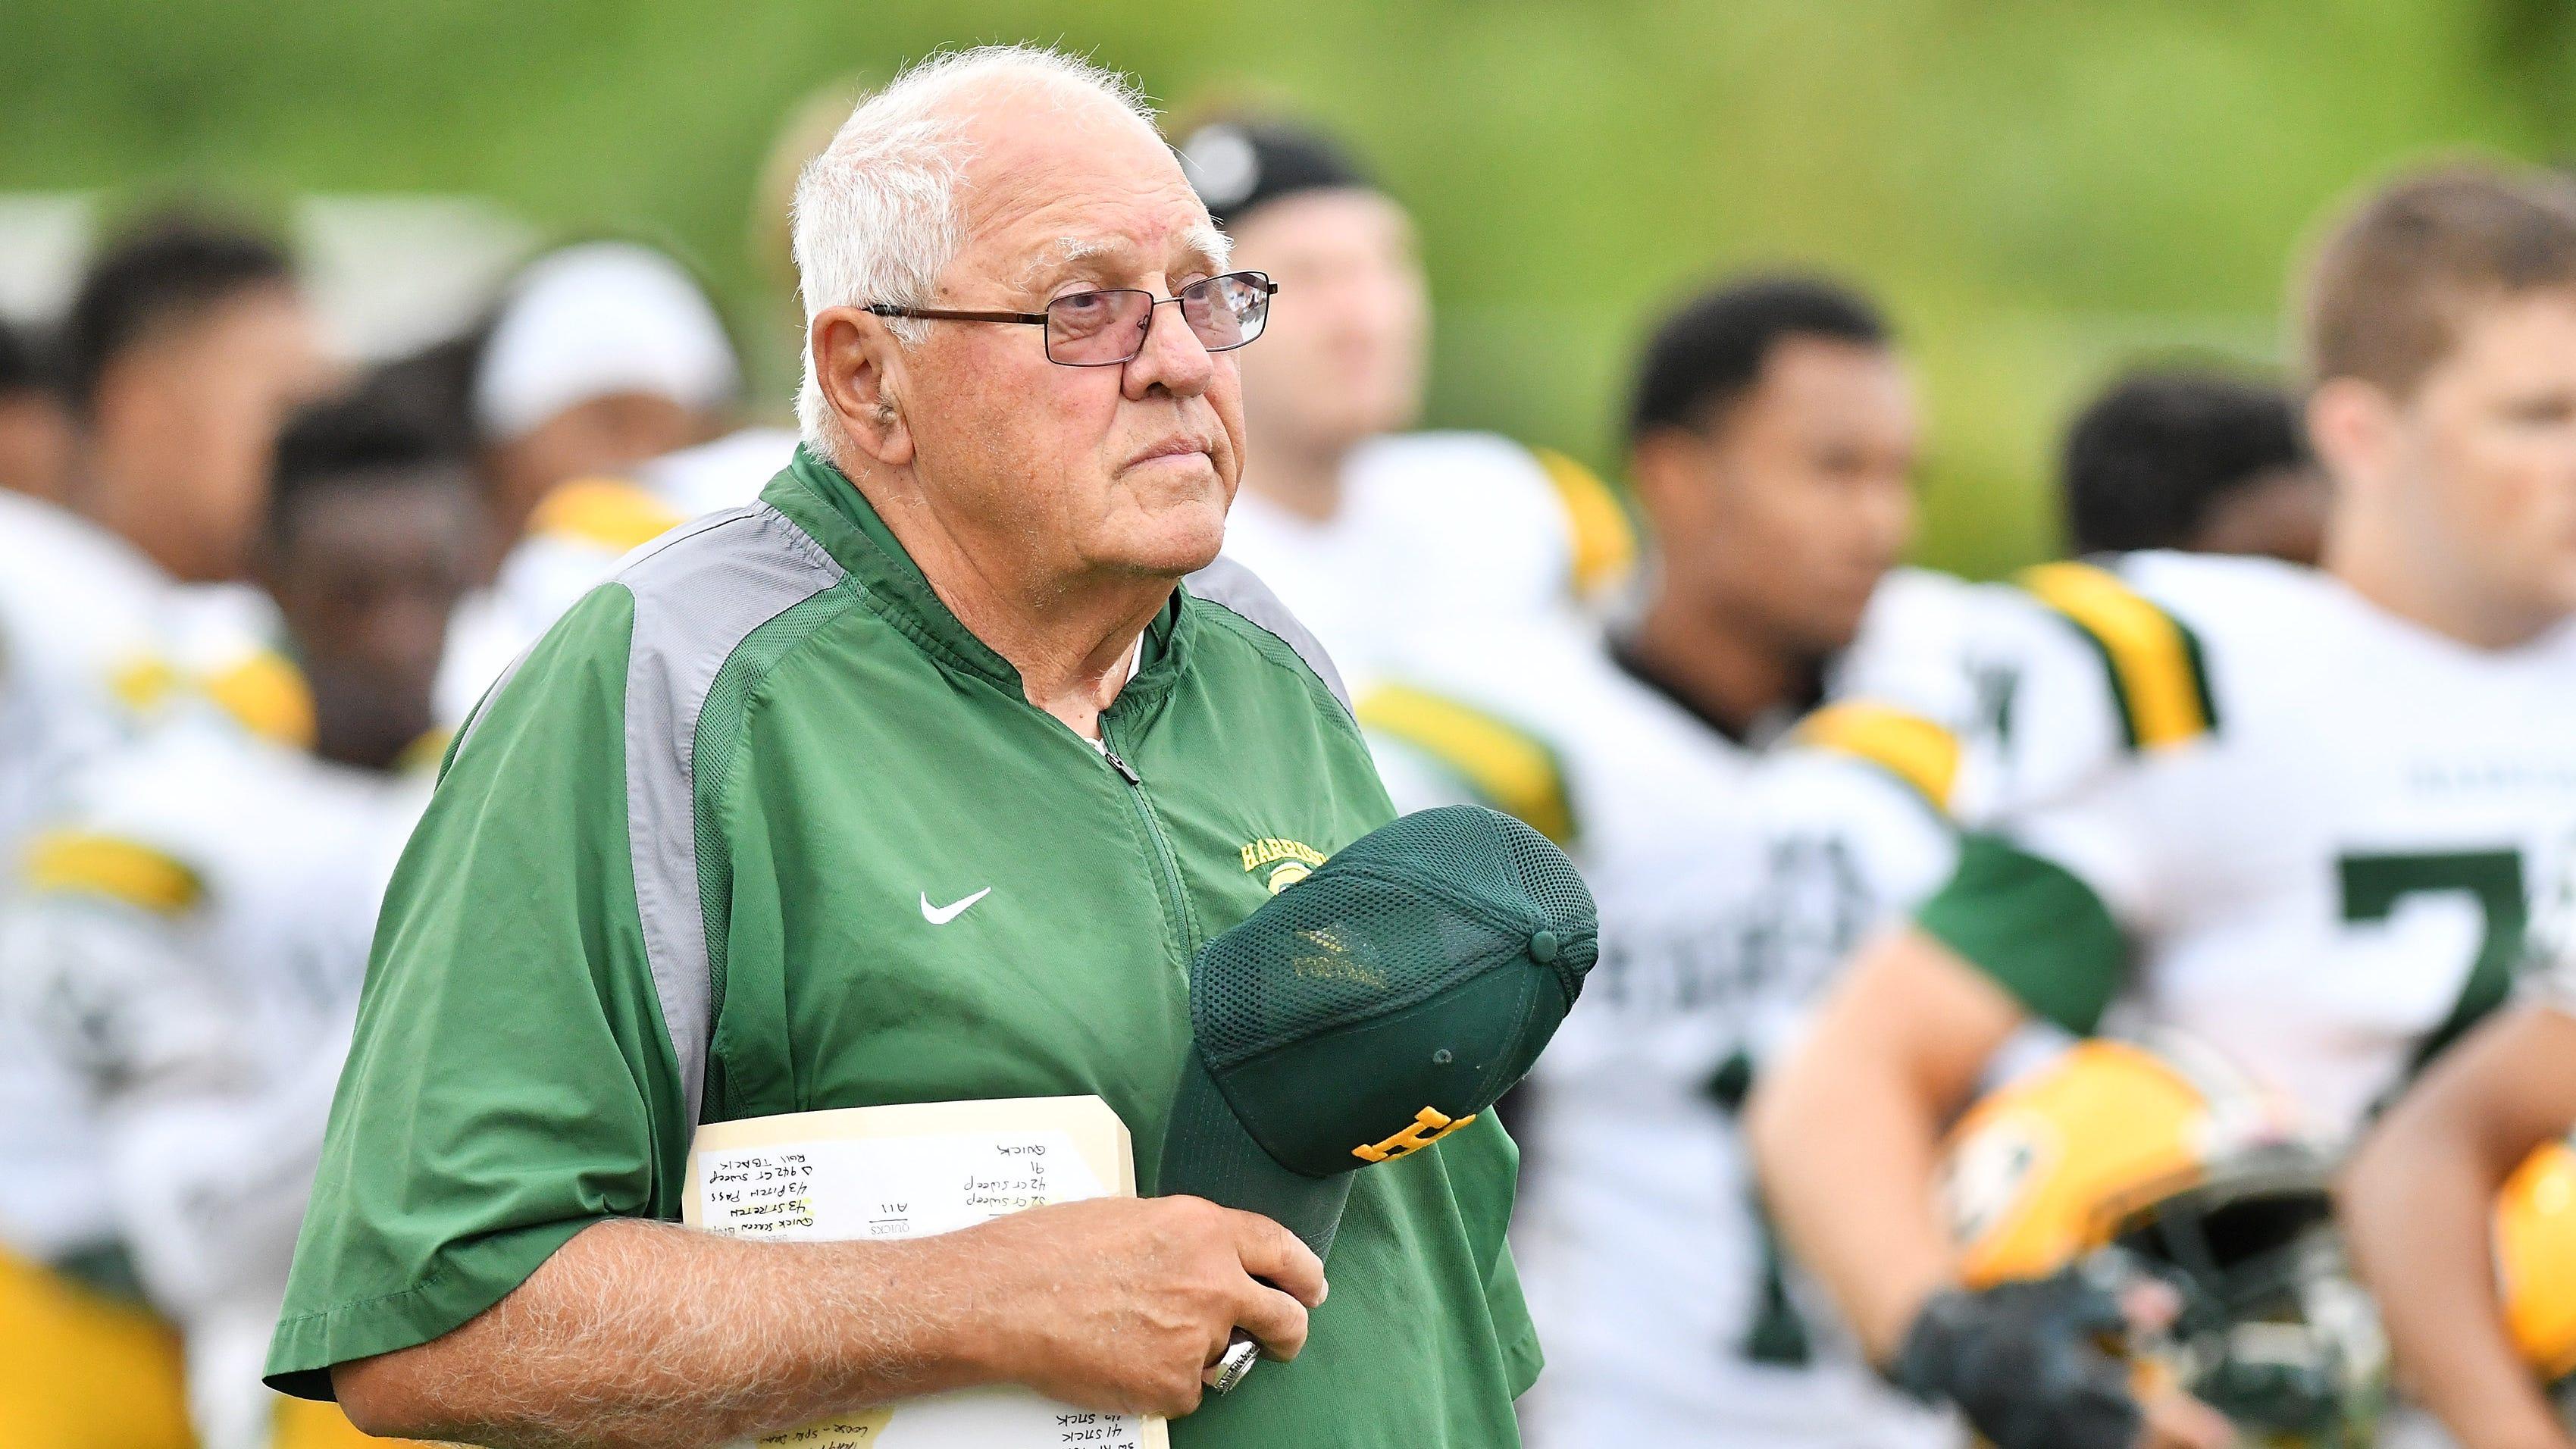 High School Football Season Gets Down To Crunch Time